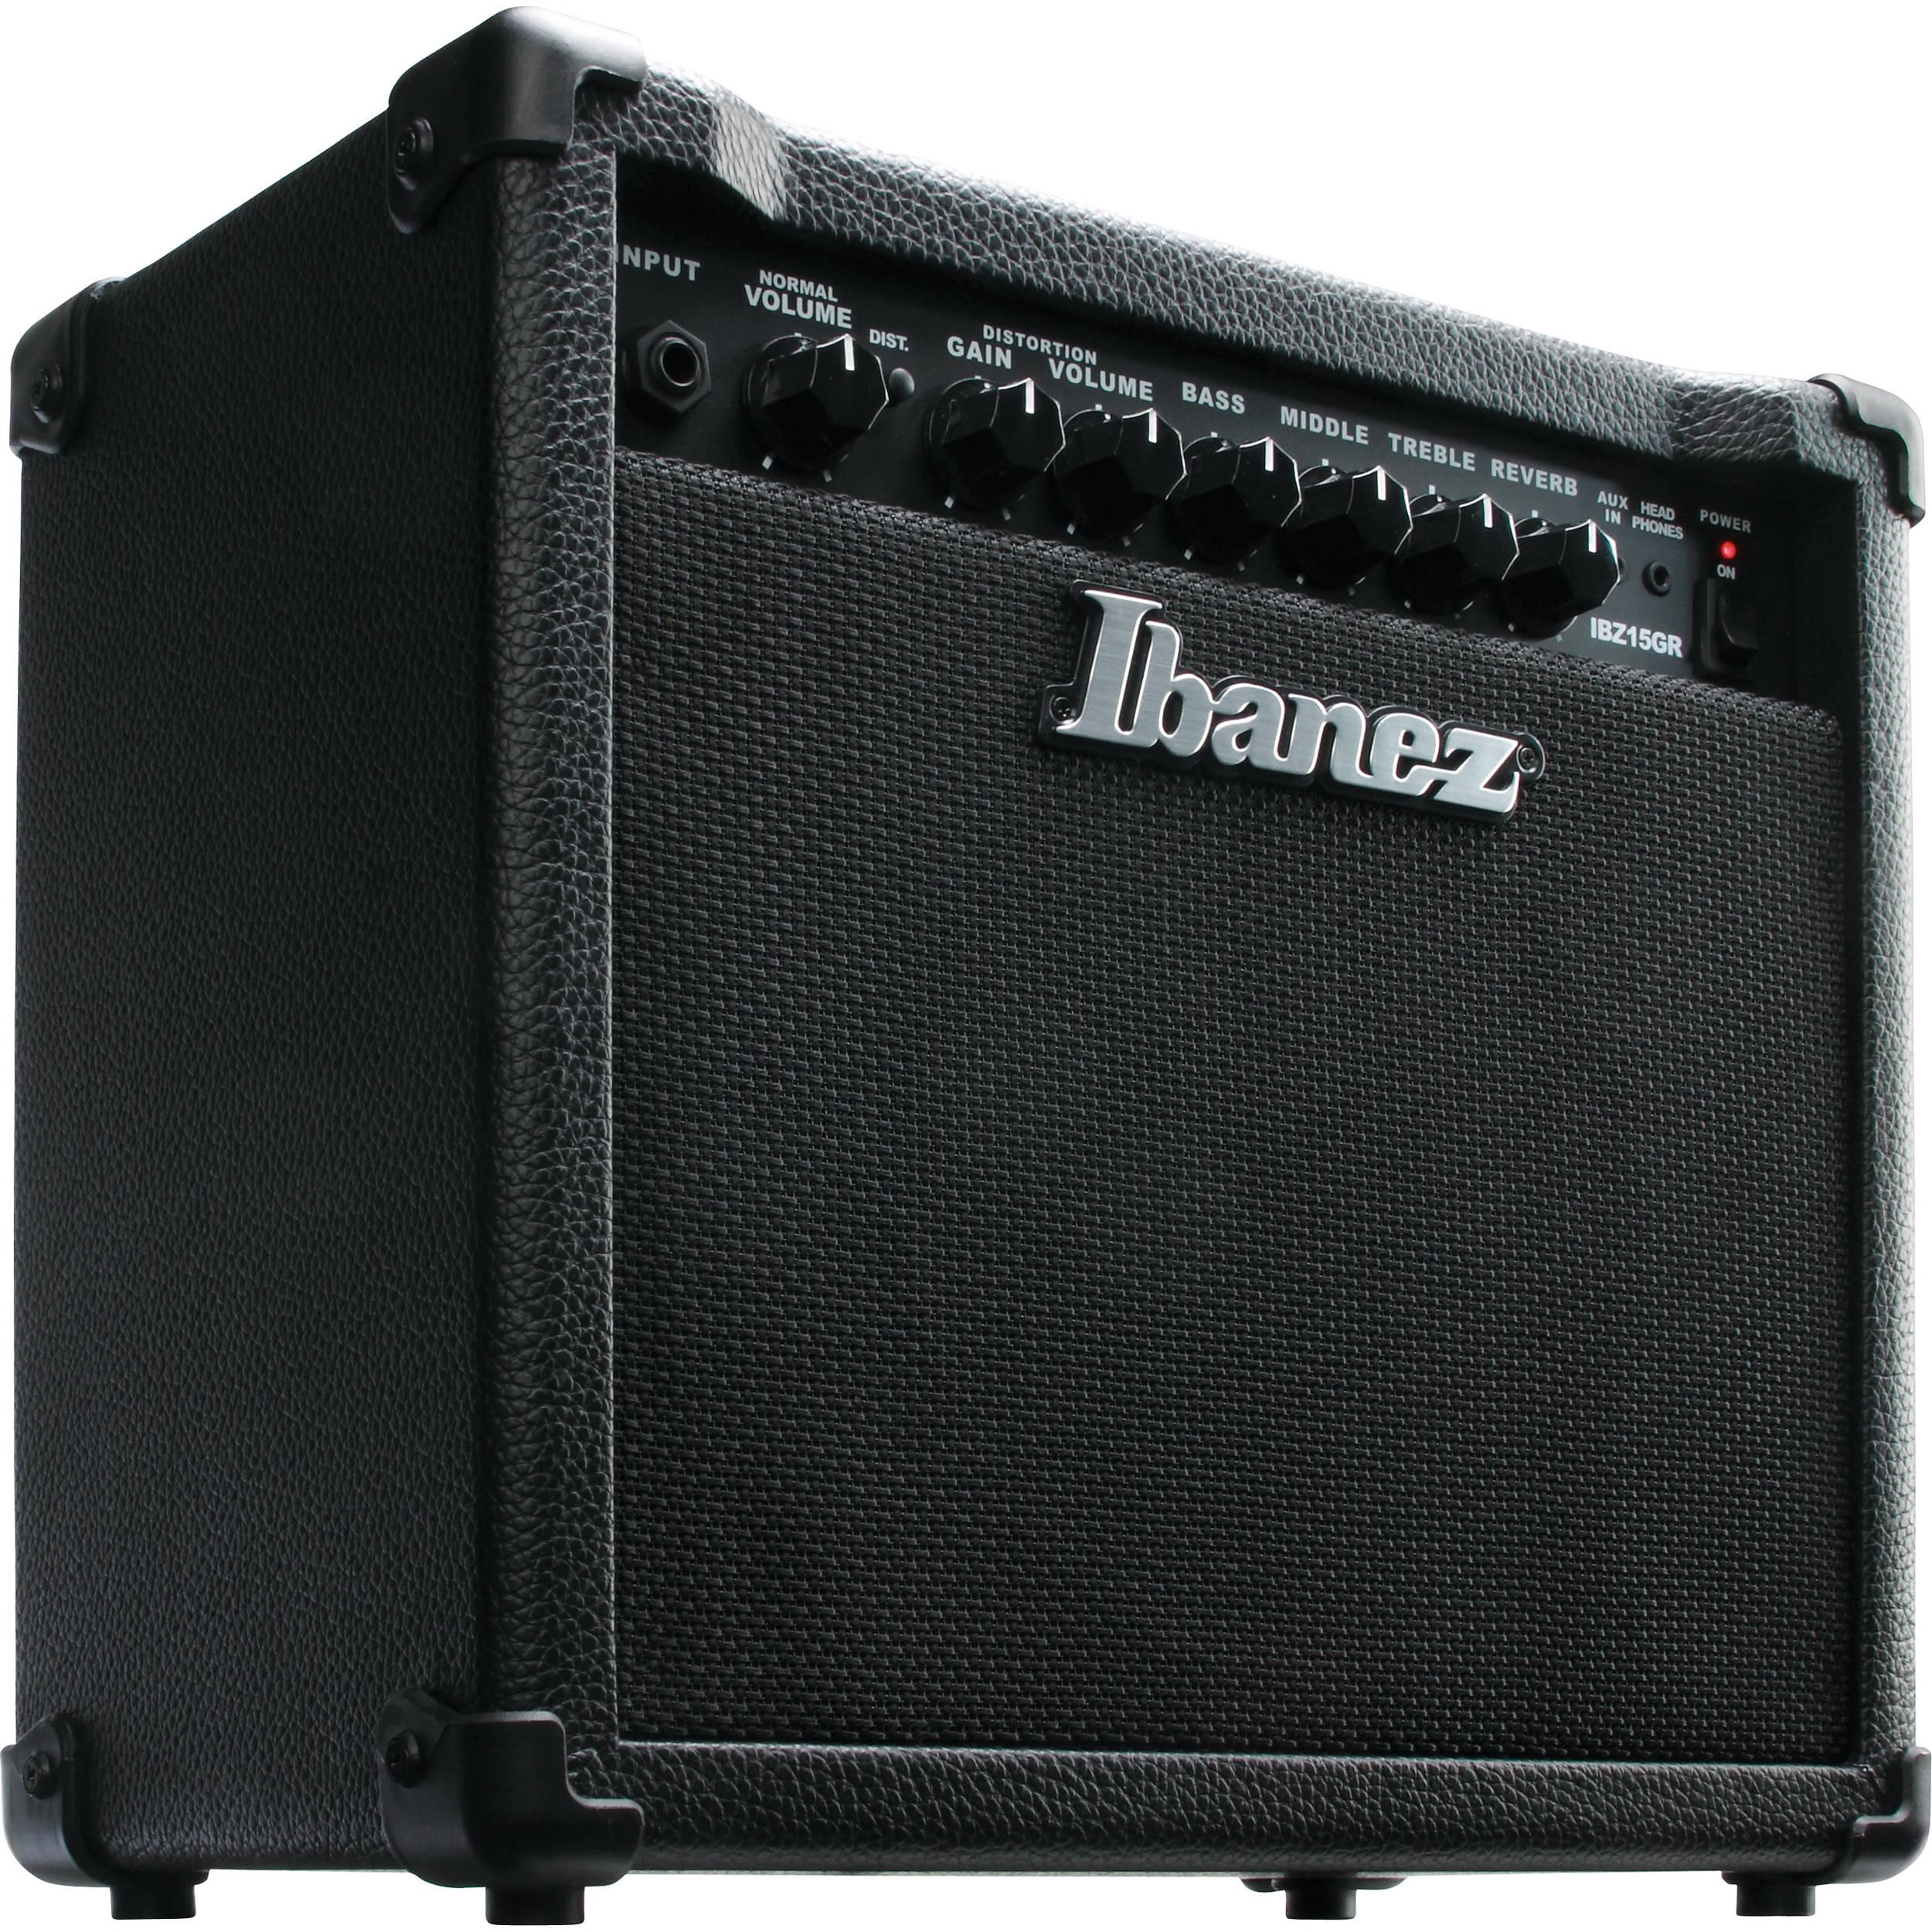 ibanez ibz15gr 15w guitar combo amplifier ibz15gr b h photo video. Black Bedroom Furniture Sets. Home Design Ideas